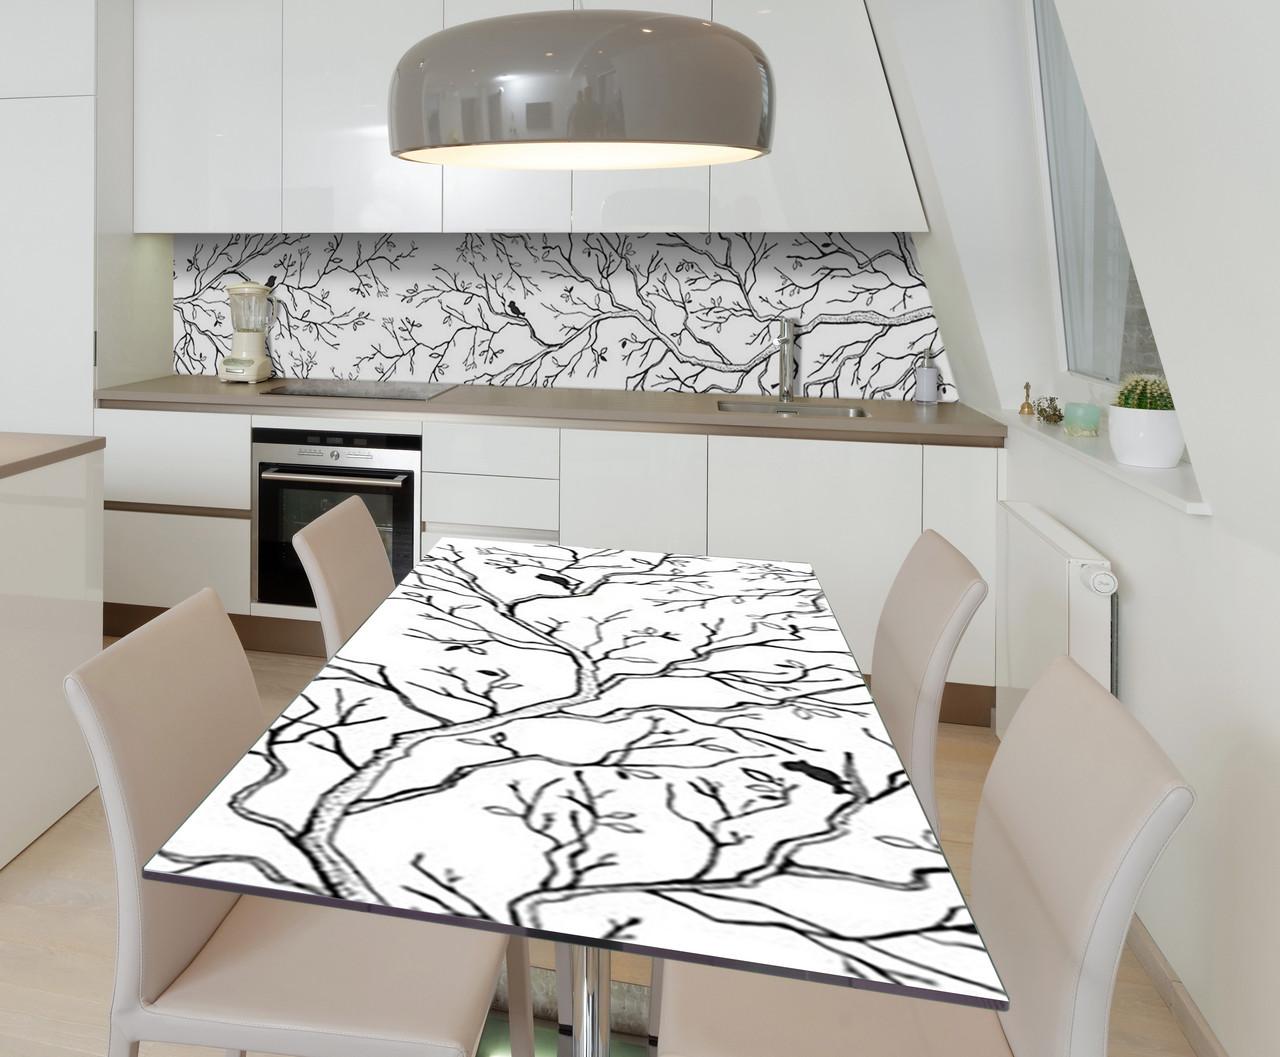 Наклейка 3Д виниловая на стол Zatarga «Утренняя песня» 650х1200 мм для домов, квартир, столов, кофейн, кафе